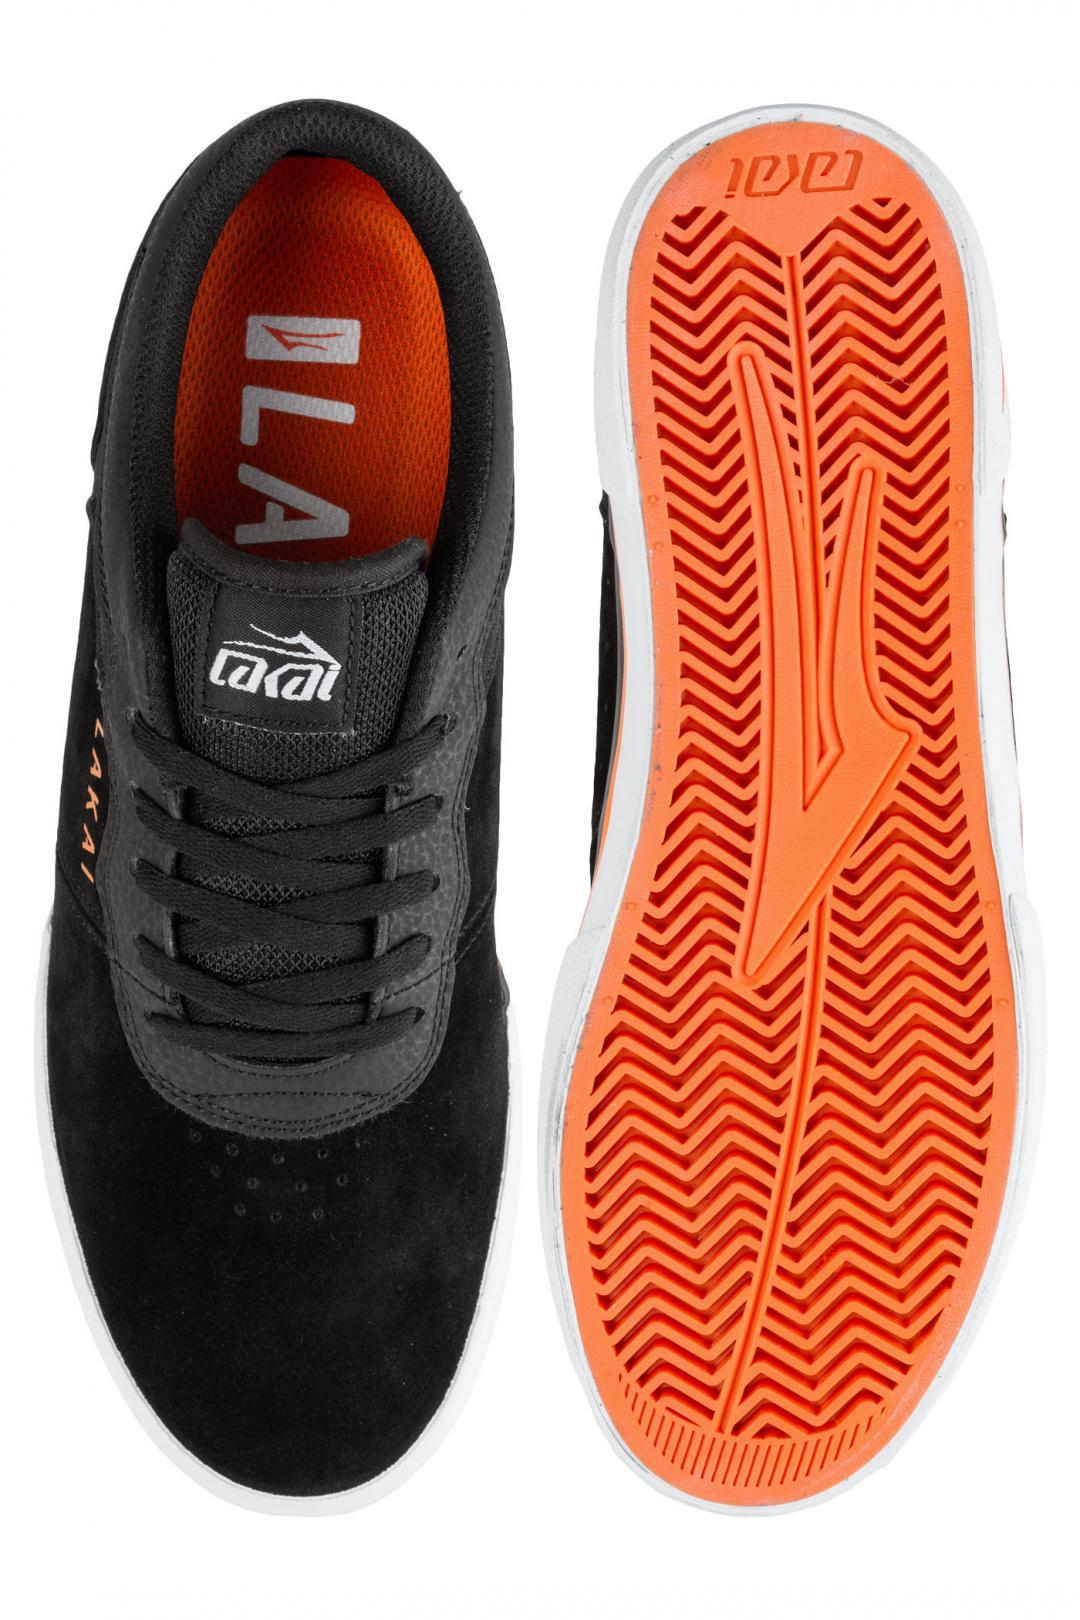 Uomo Lakai Staple Suede black orange | Sneaker